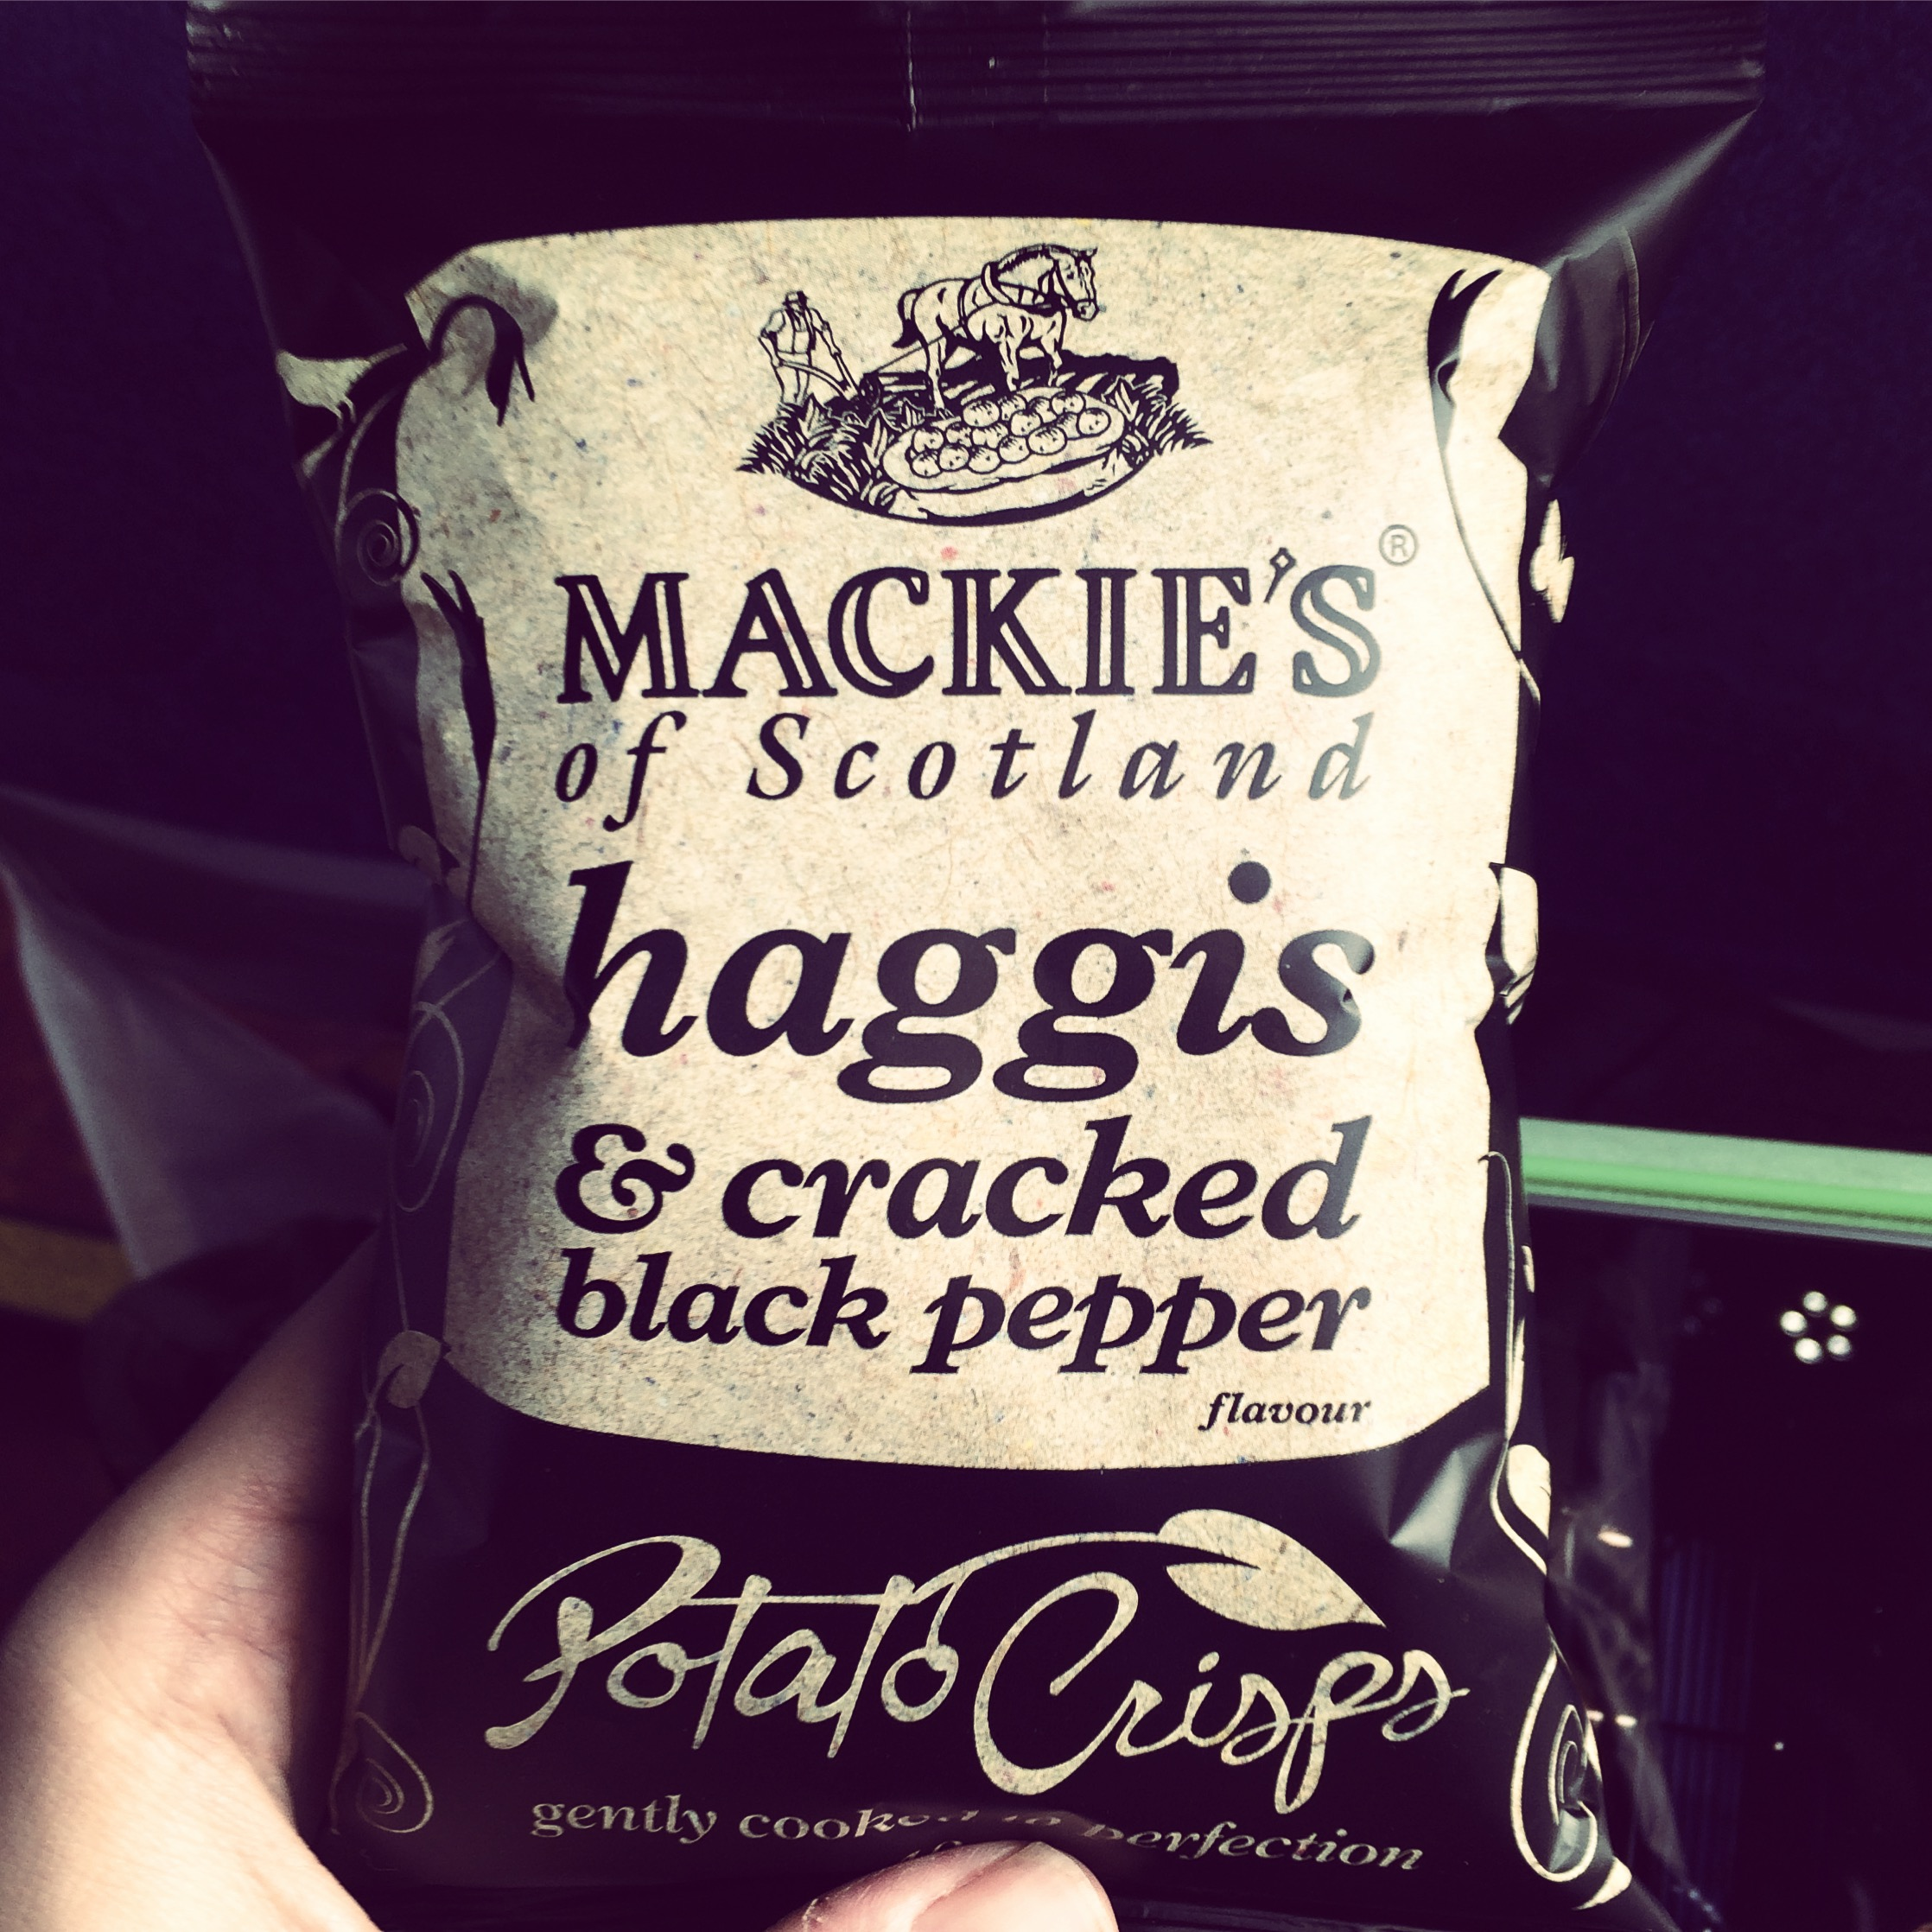 Haggis Crisps!